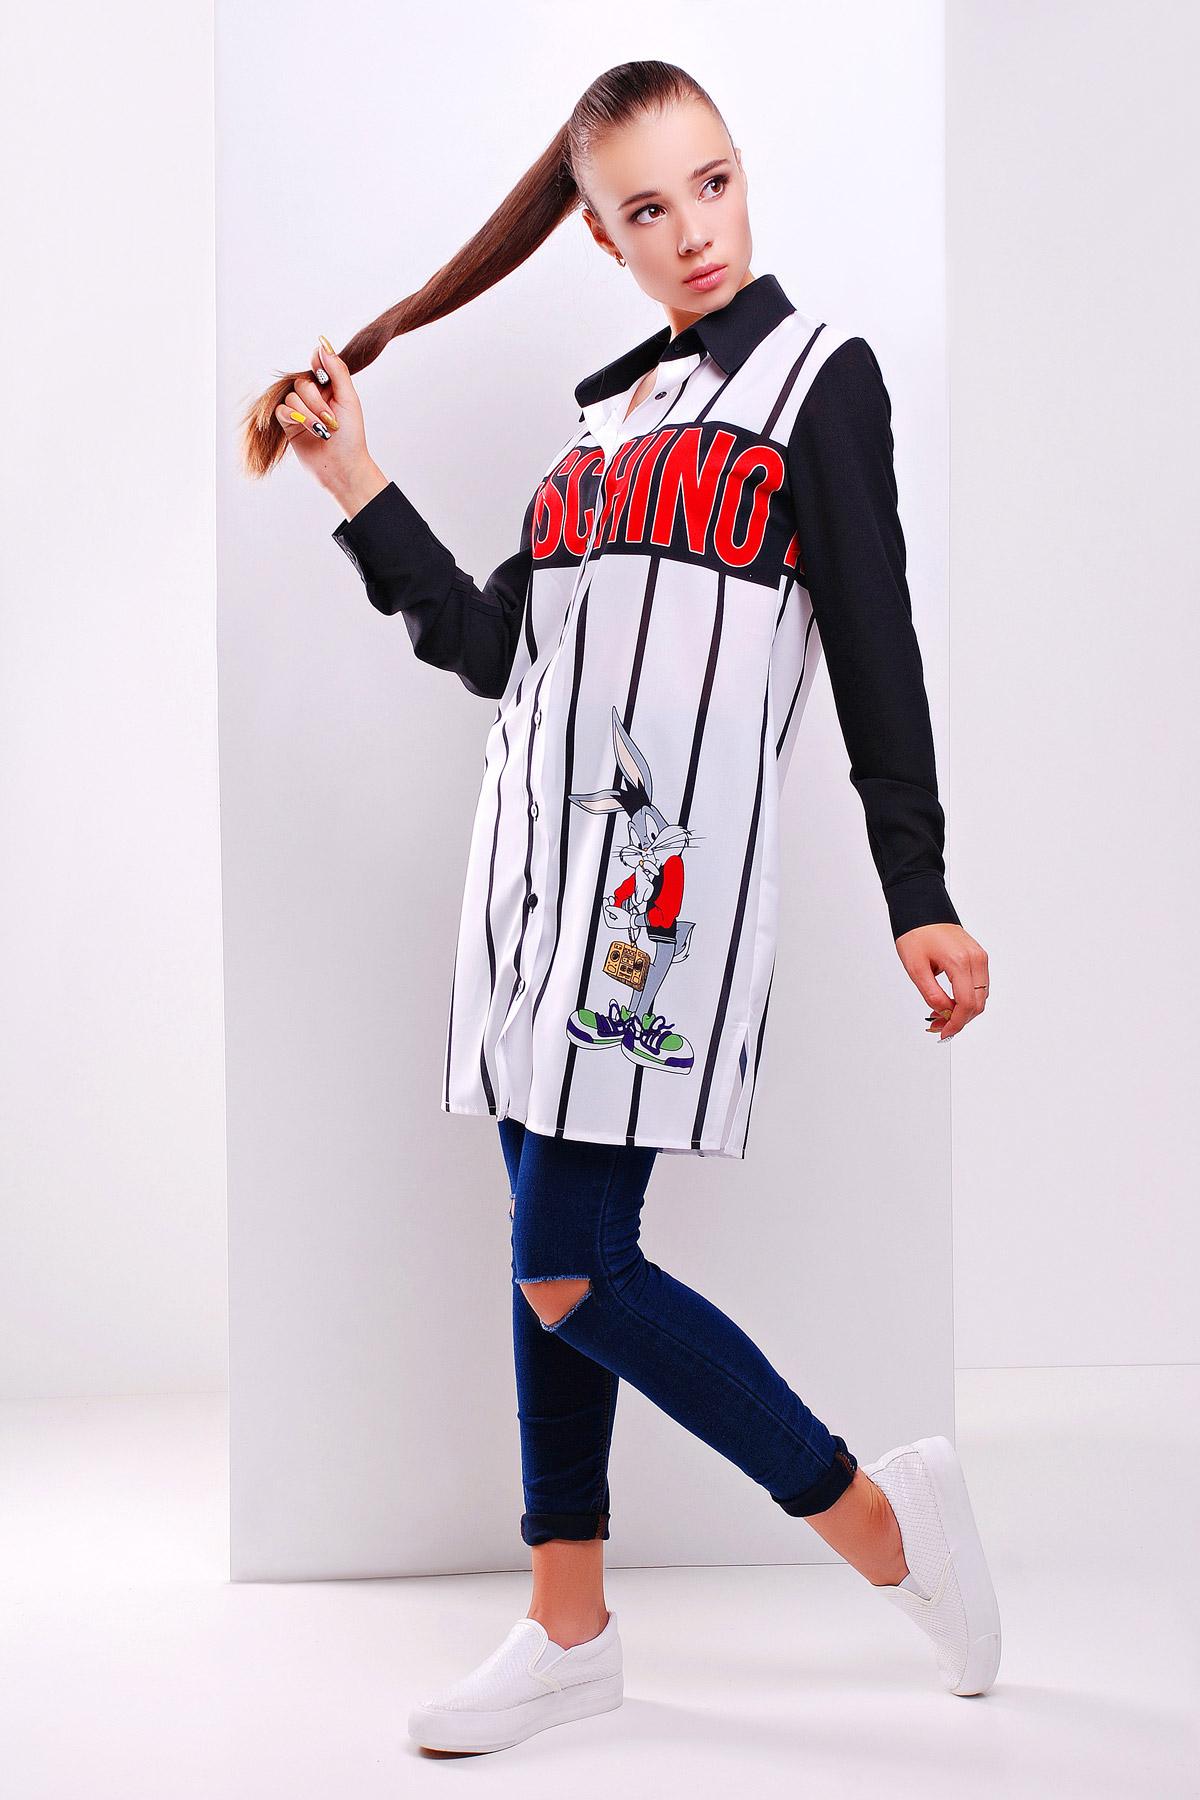 c546cbf1be2 длинная женская рубашка с модным принтом Moschino. Moschino рубашка Марена  д р. Цвет